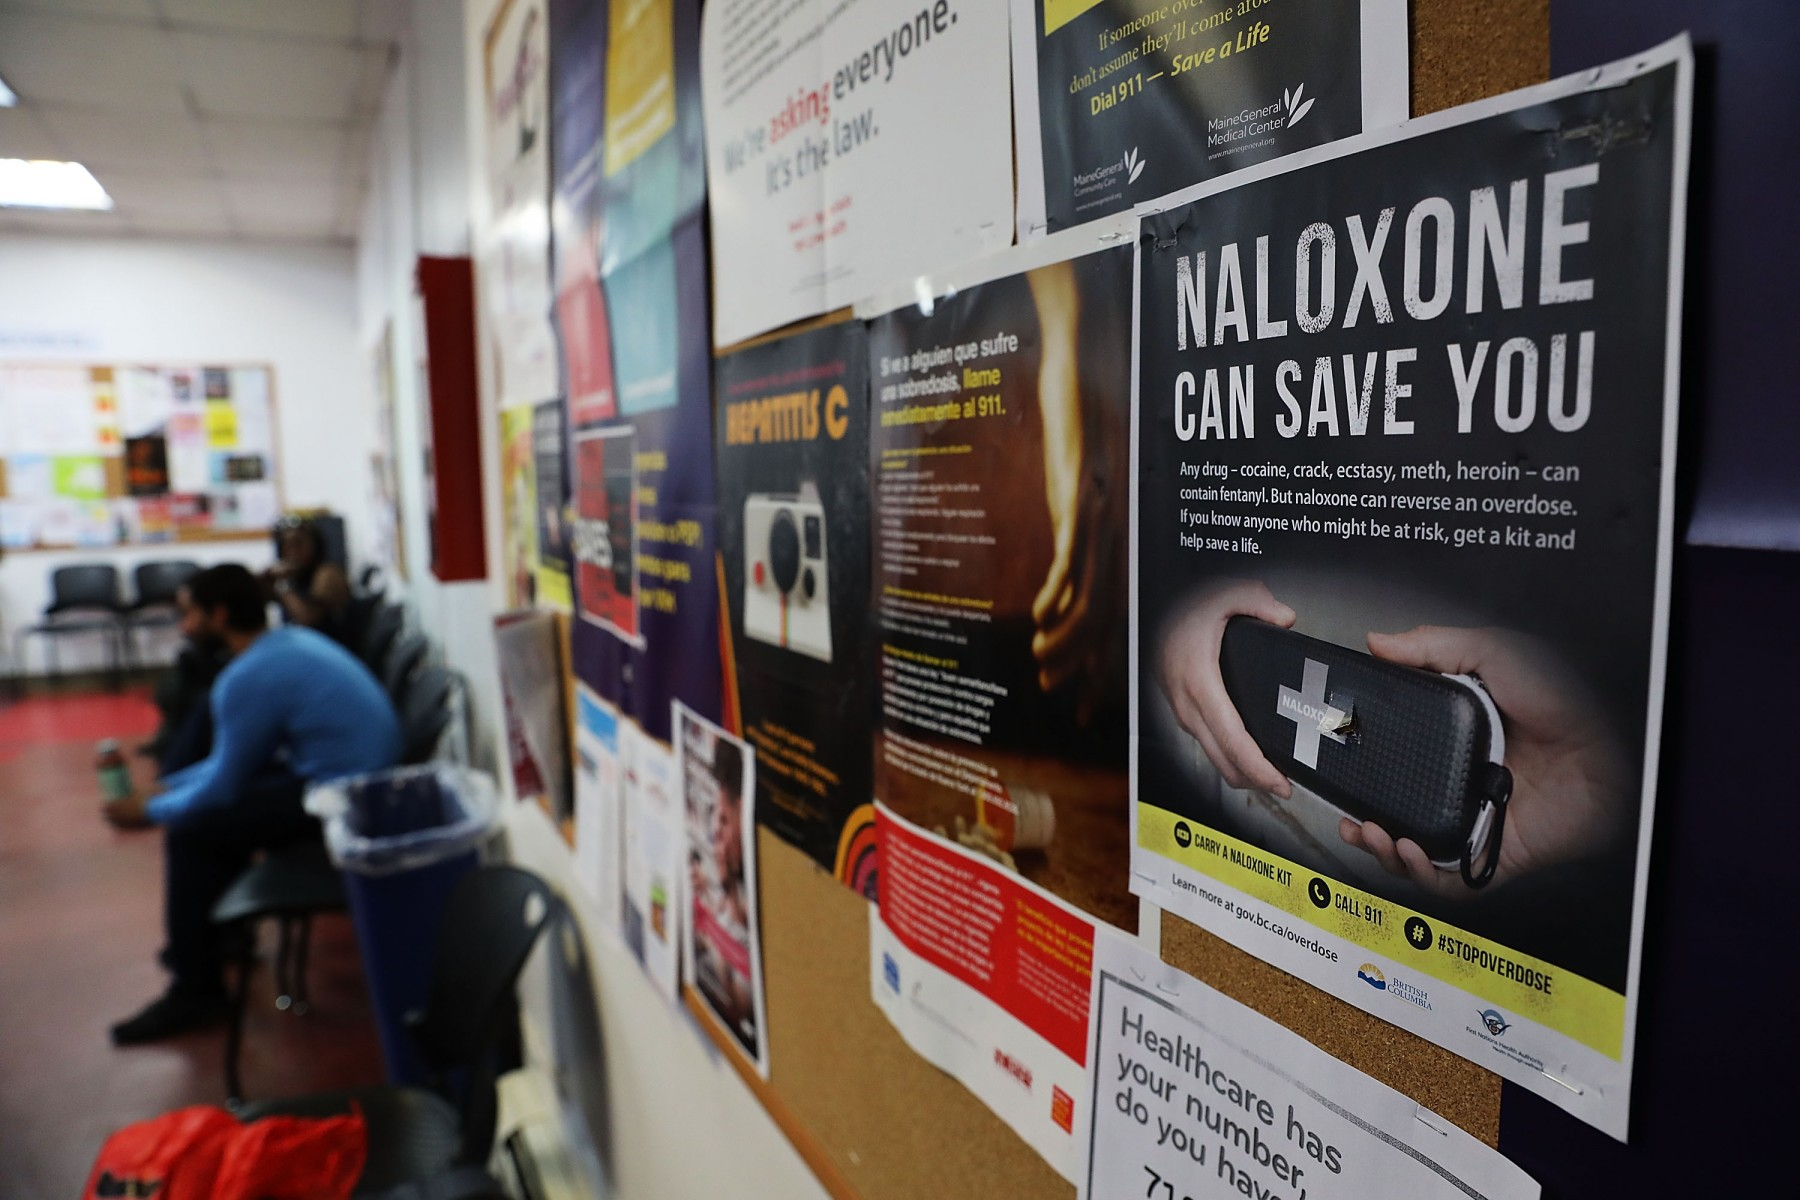 Naloxone Access Doesn't Make Heroin Seem Less Risky